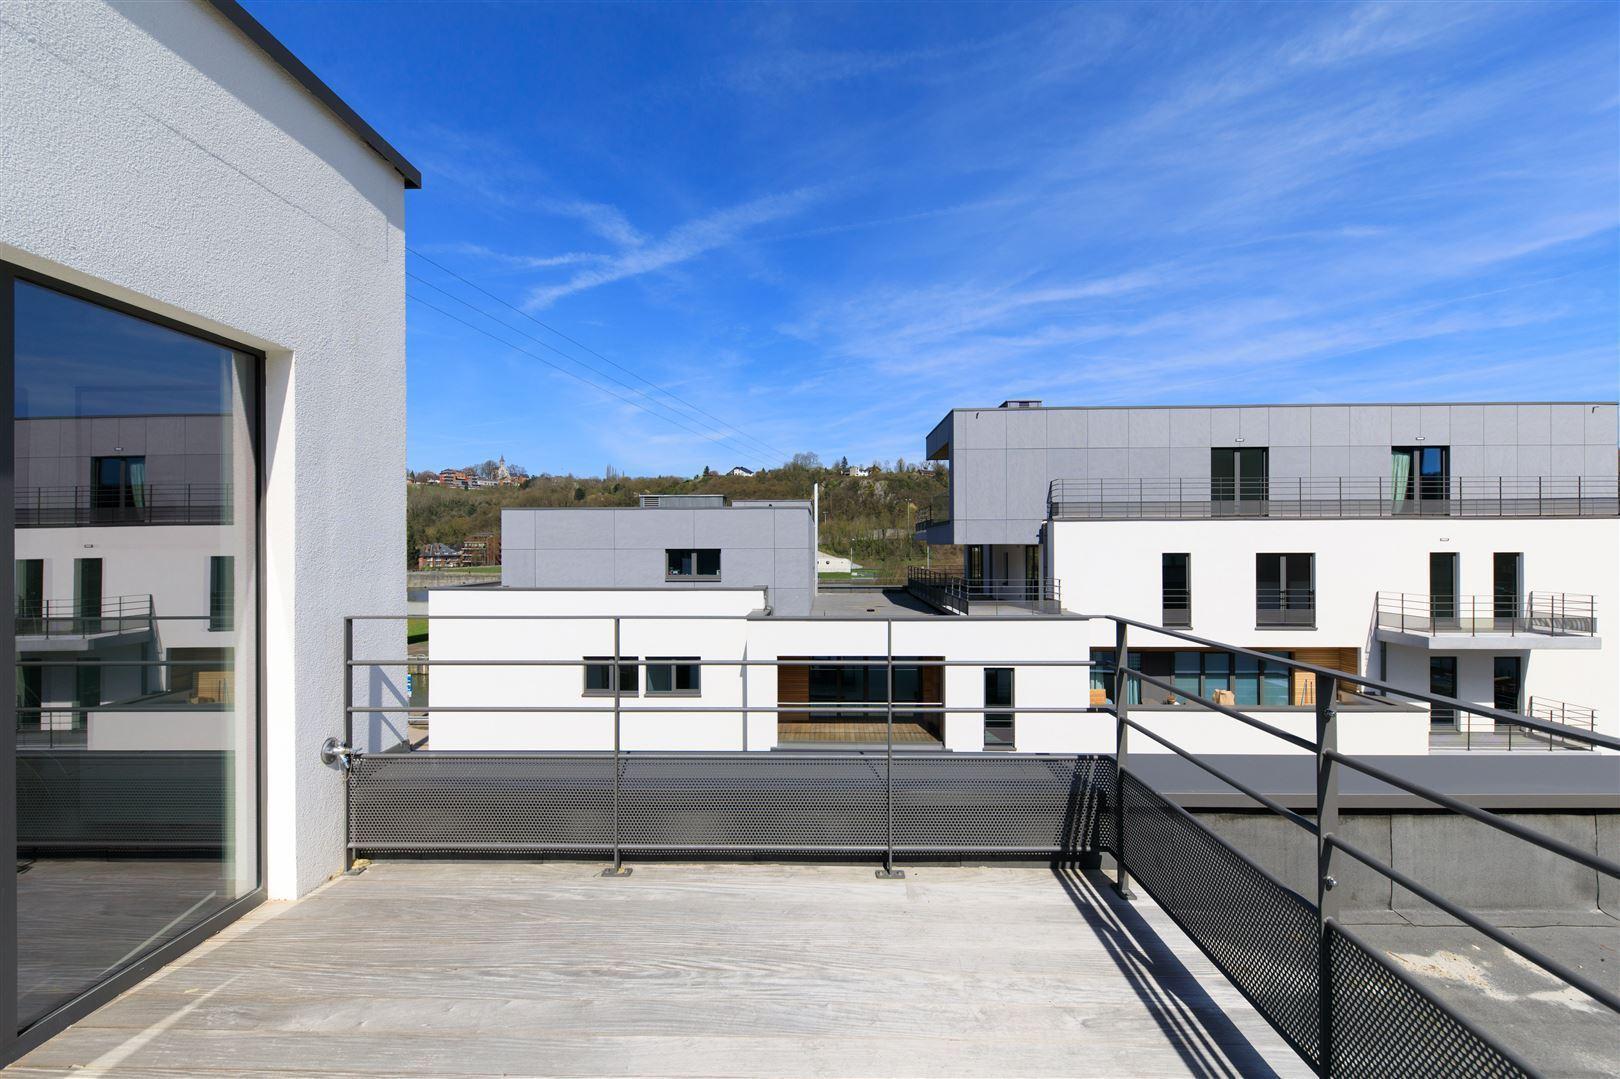 Les Terrasses de l'Ecluse - 5100 JAMBES